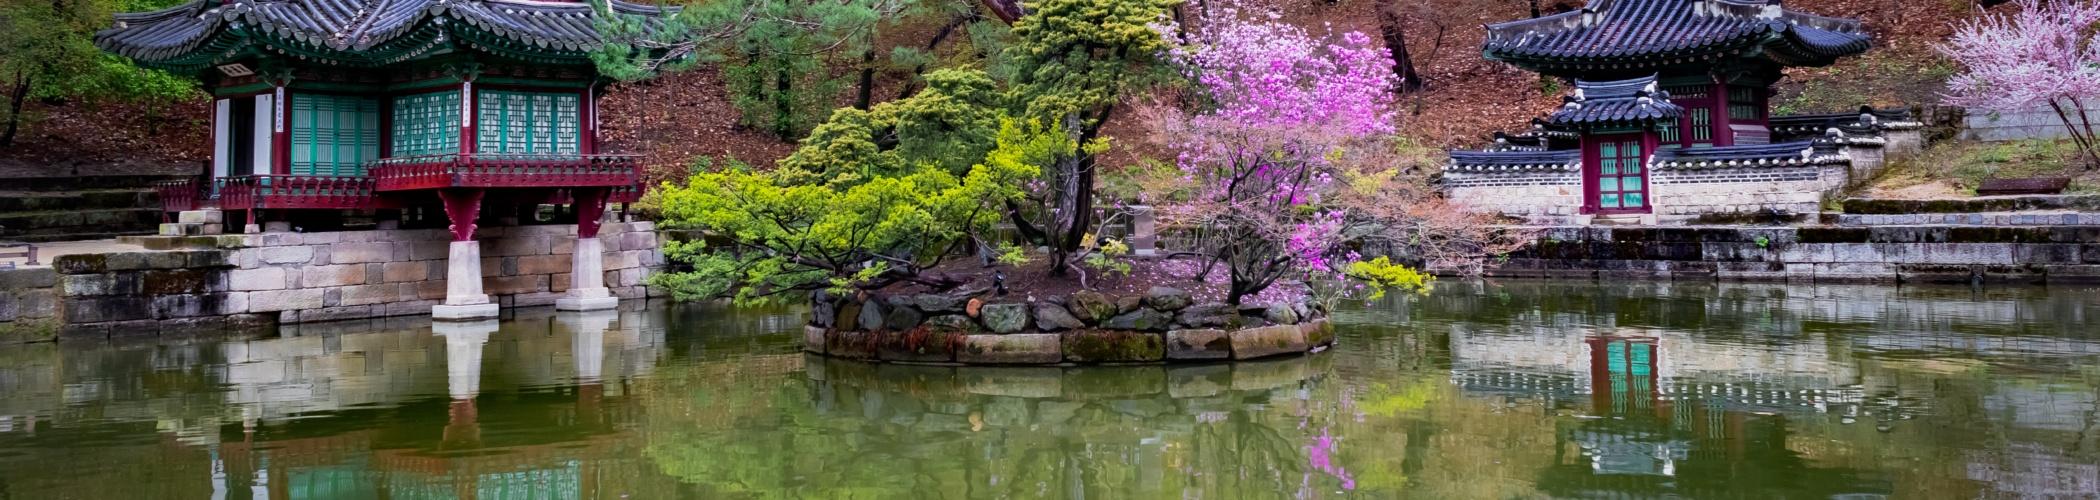 http://www.tangsoodoitalia.com/wp-content/uploads/2021/06/early-spring-buyongji-pond-gardens-changdeokgung-palace-2100x500.jpg